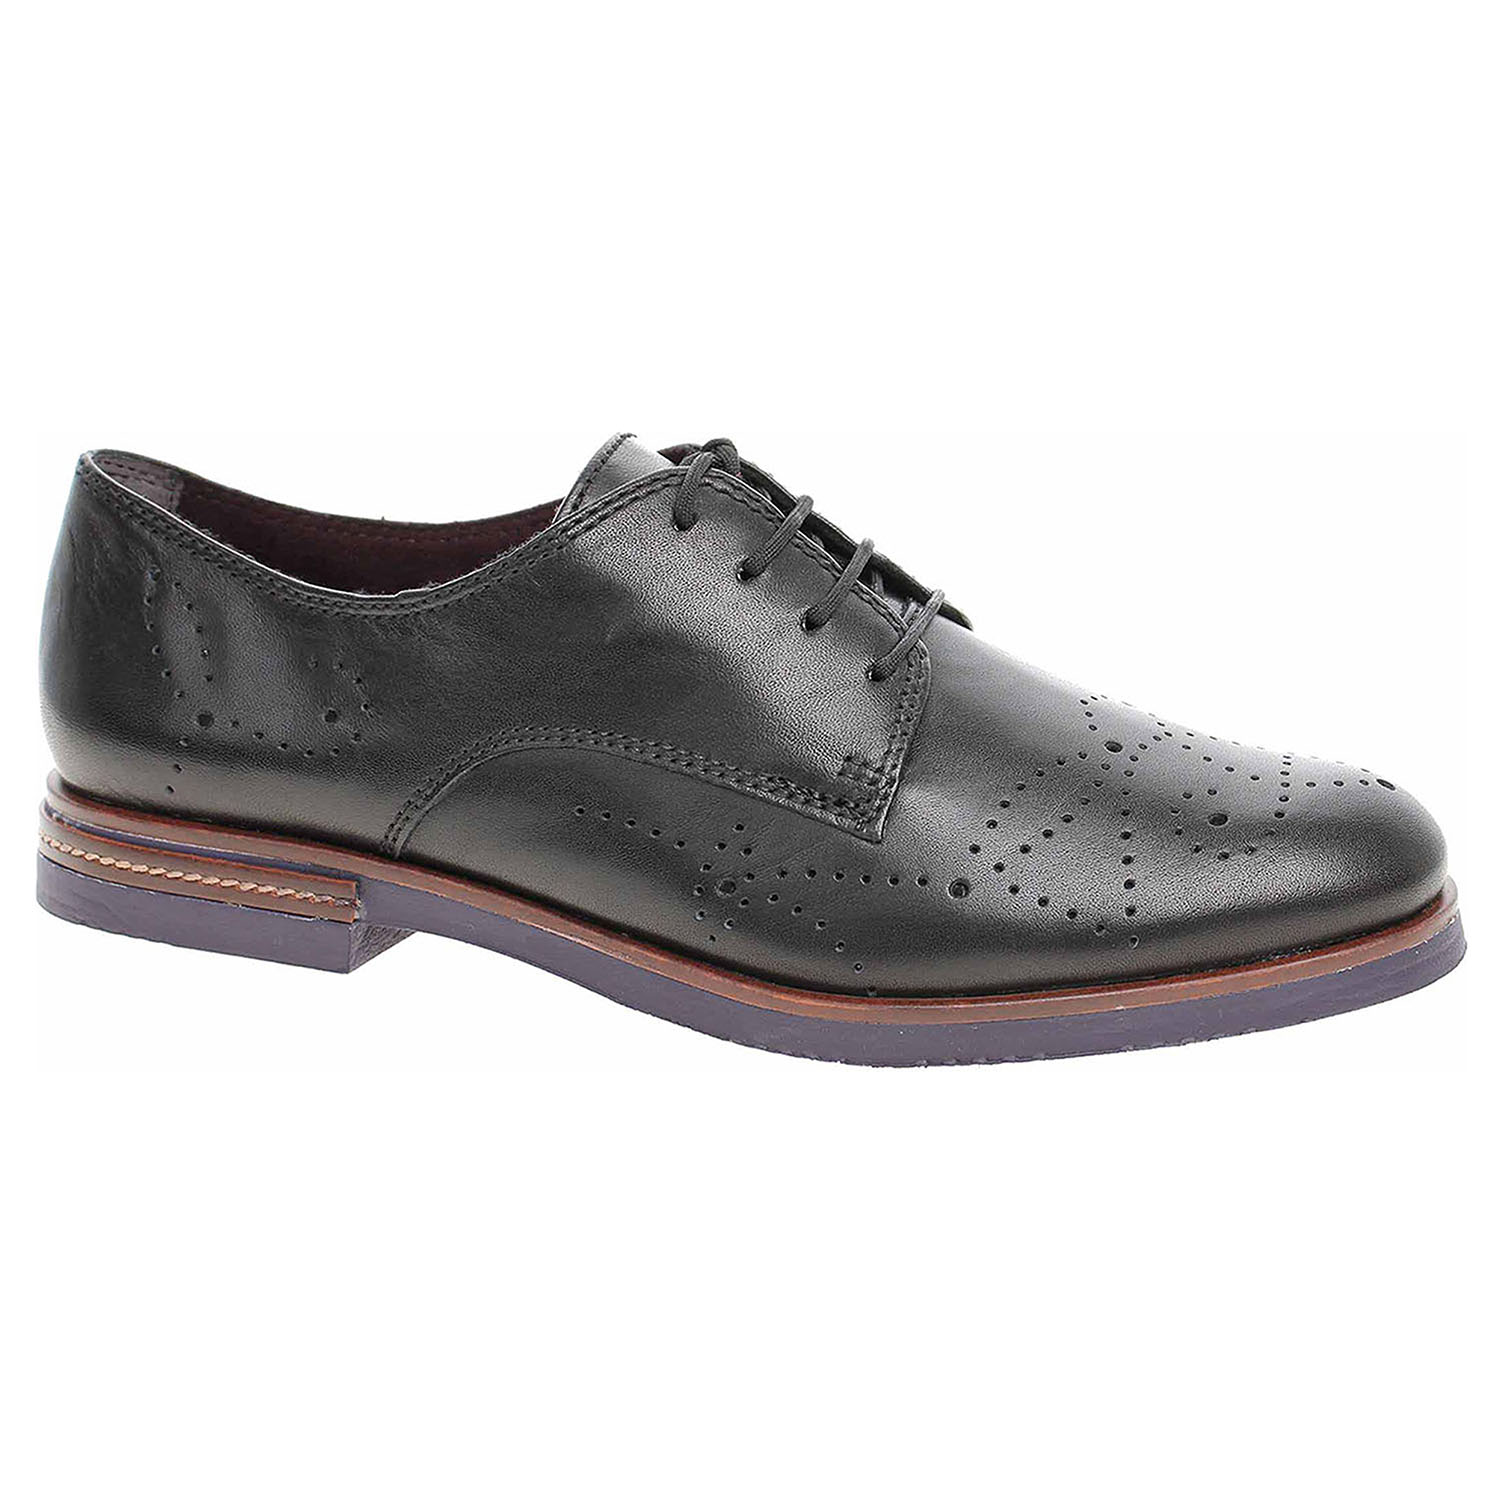 49076a269 Dámske poltopánky Tamaris 1-23208-31 black | REJNOK obuv